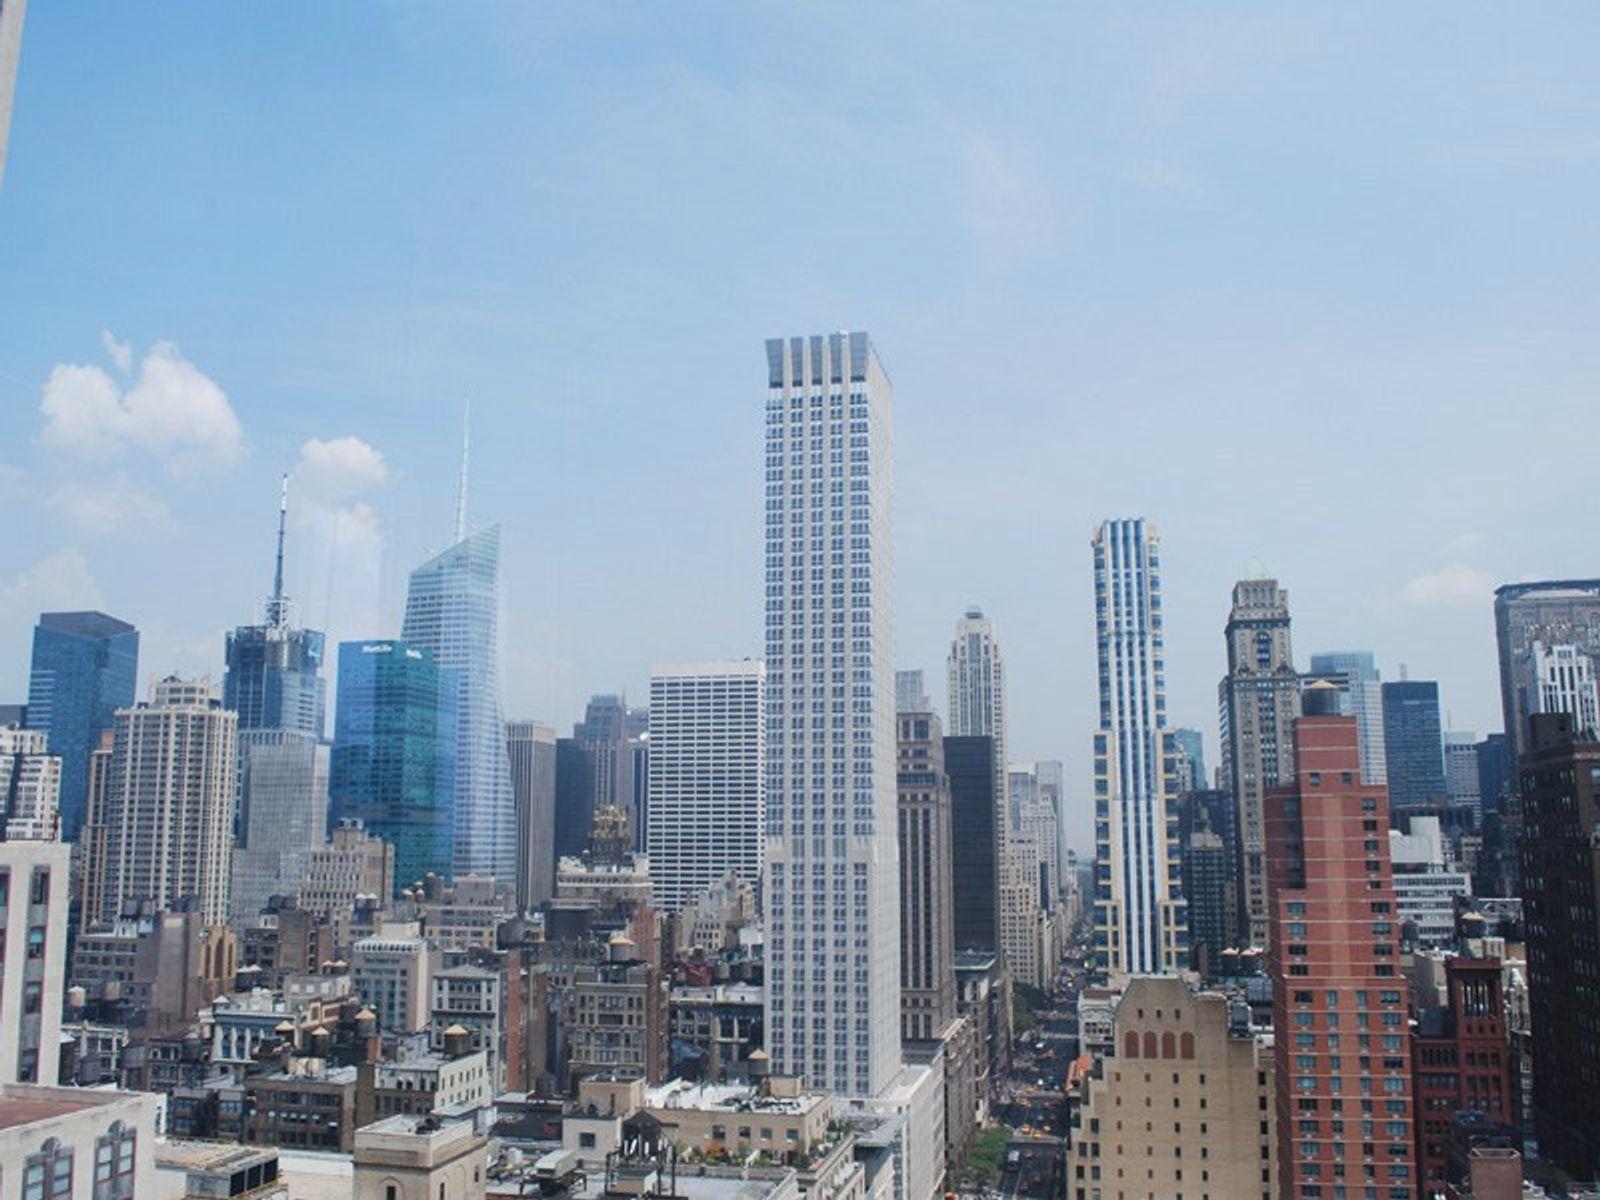 325 Fifth Avenue